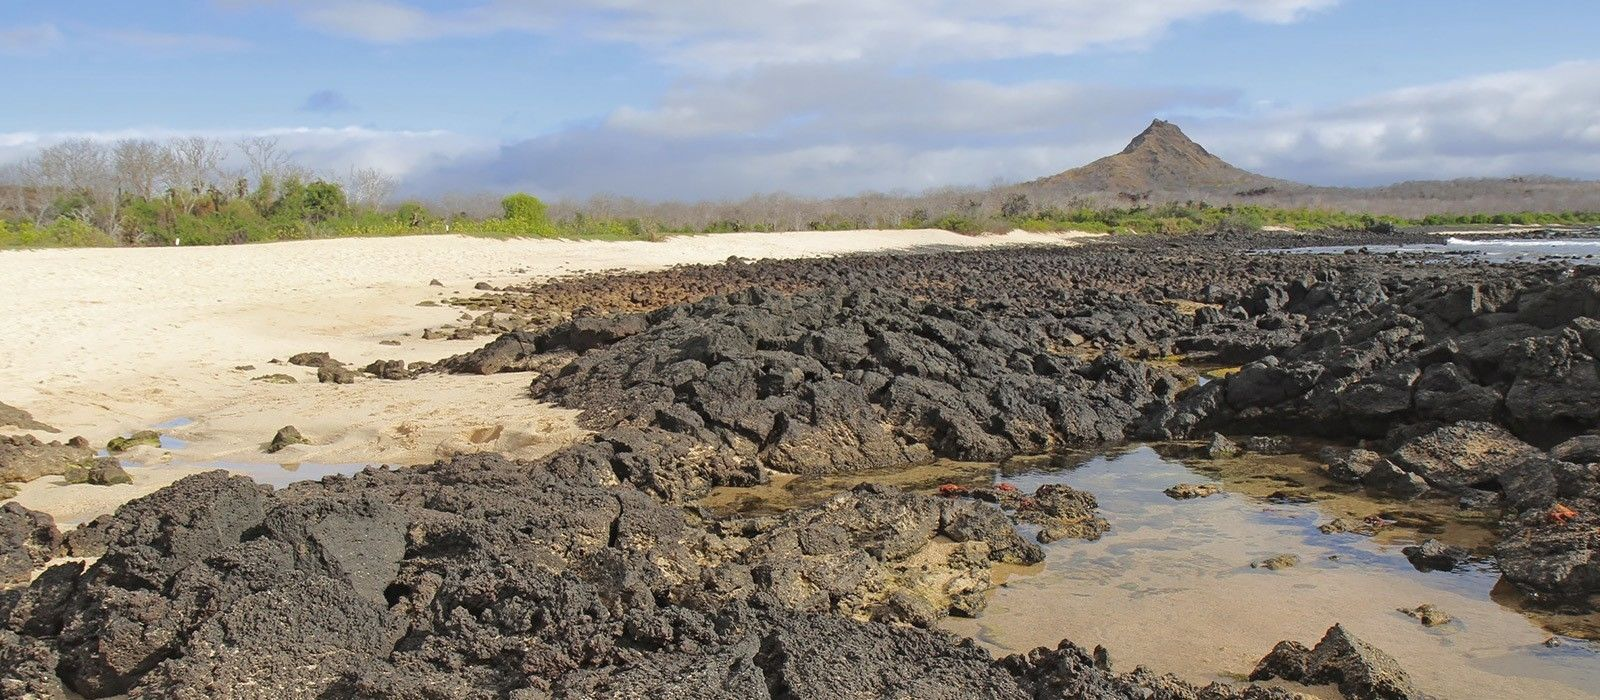 Destination Isla Santa Cruz Ecuador/Galapagos